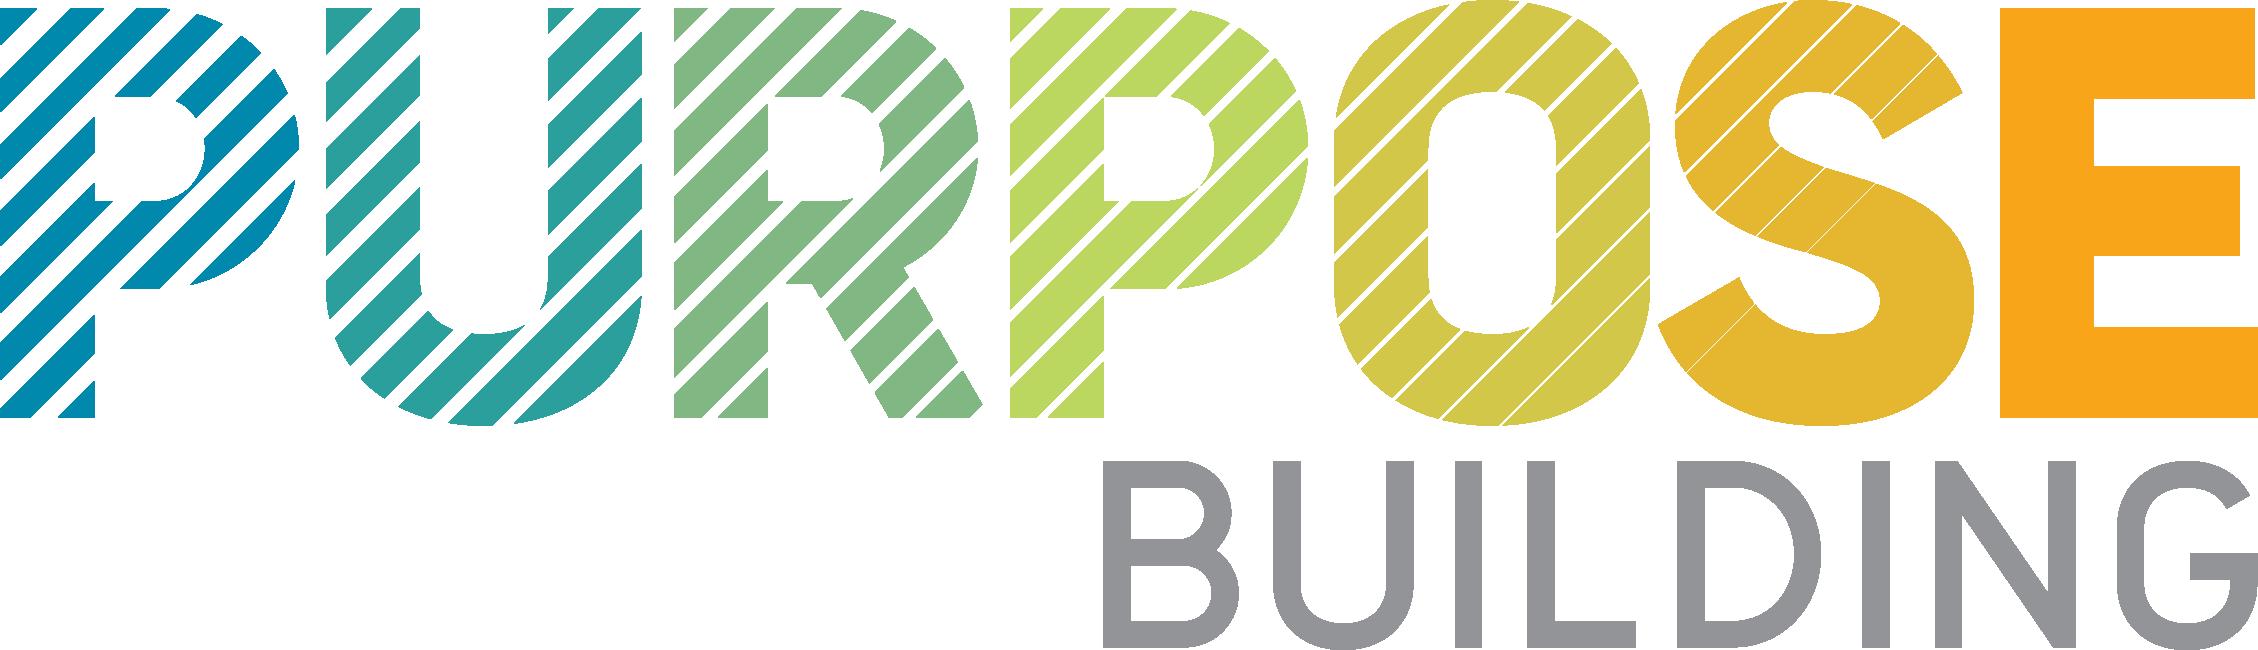 Purpose_id_RGB.png